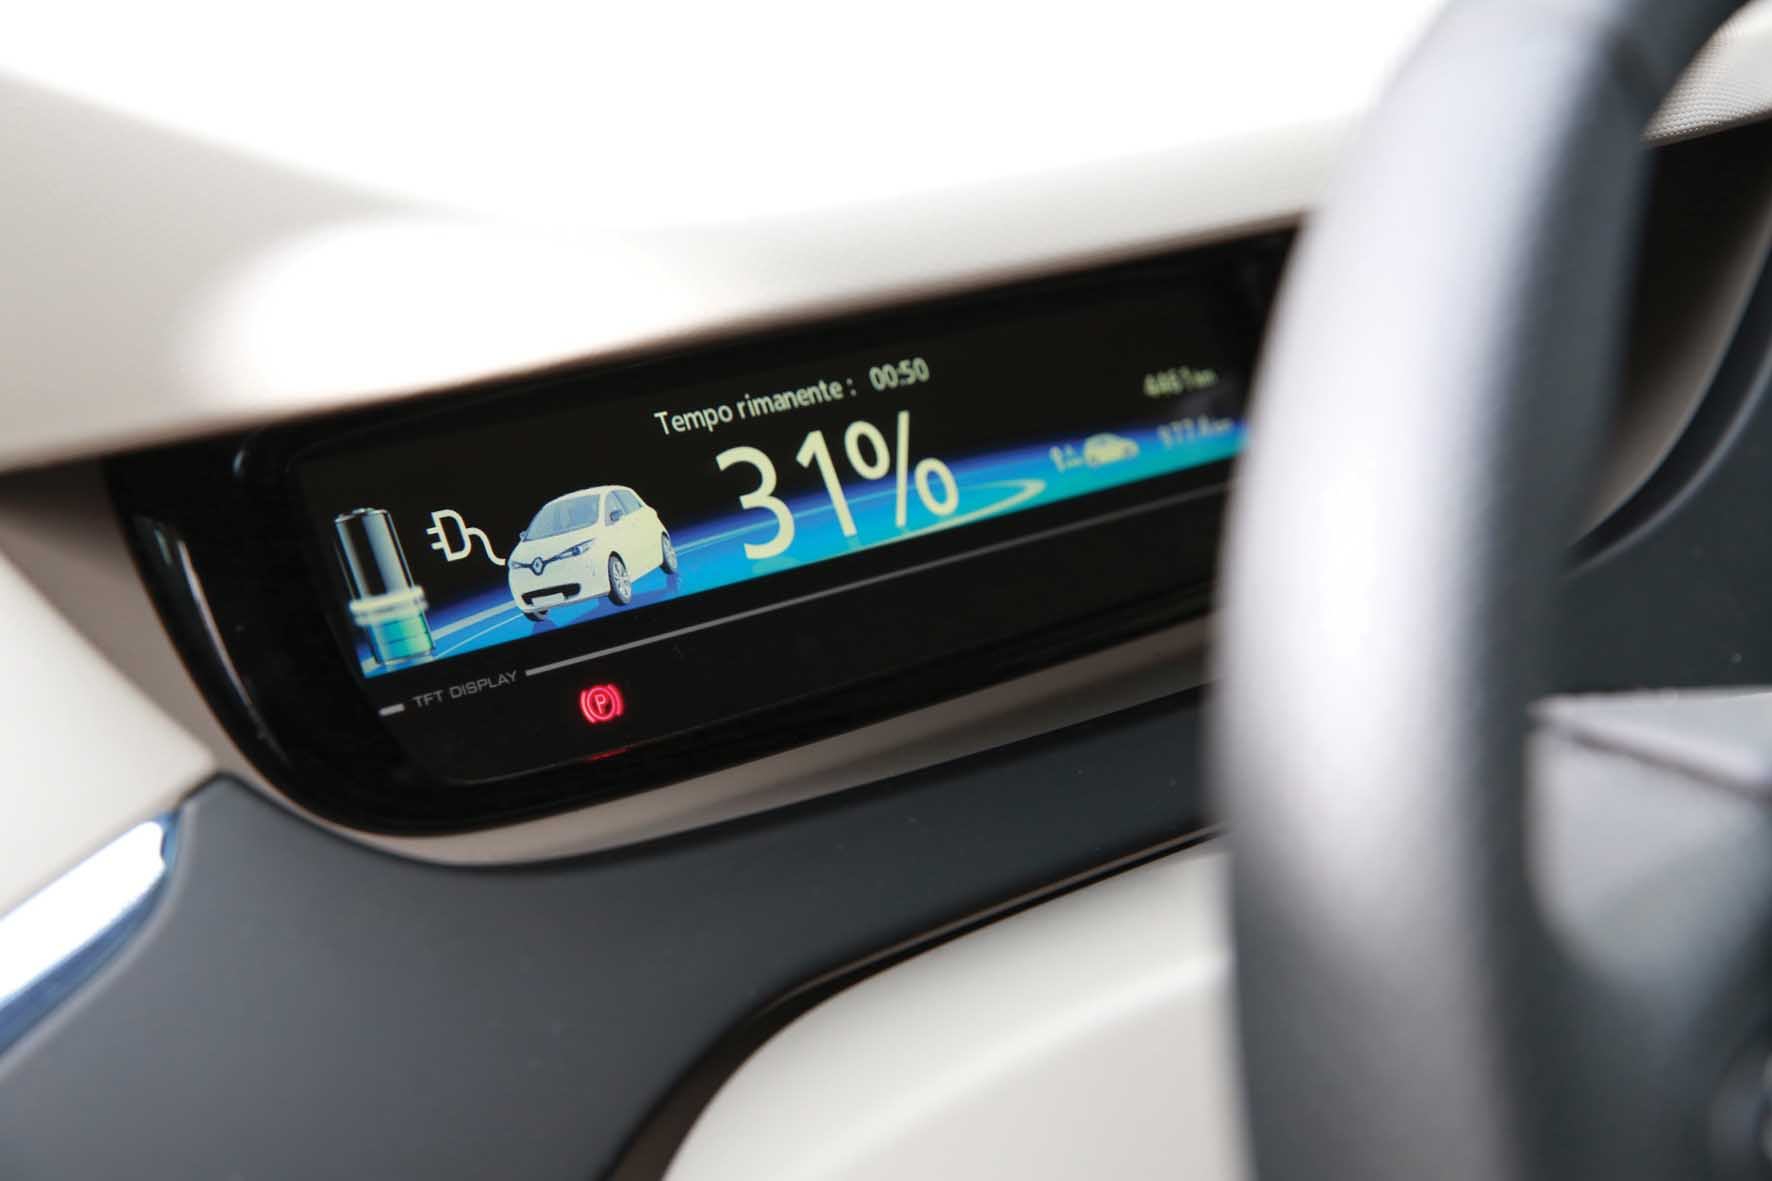 renault 2013 colonna ricarica rapida enel 43 kW zoe tempo ricarica 1